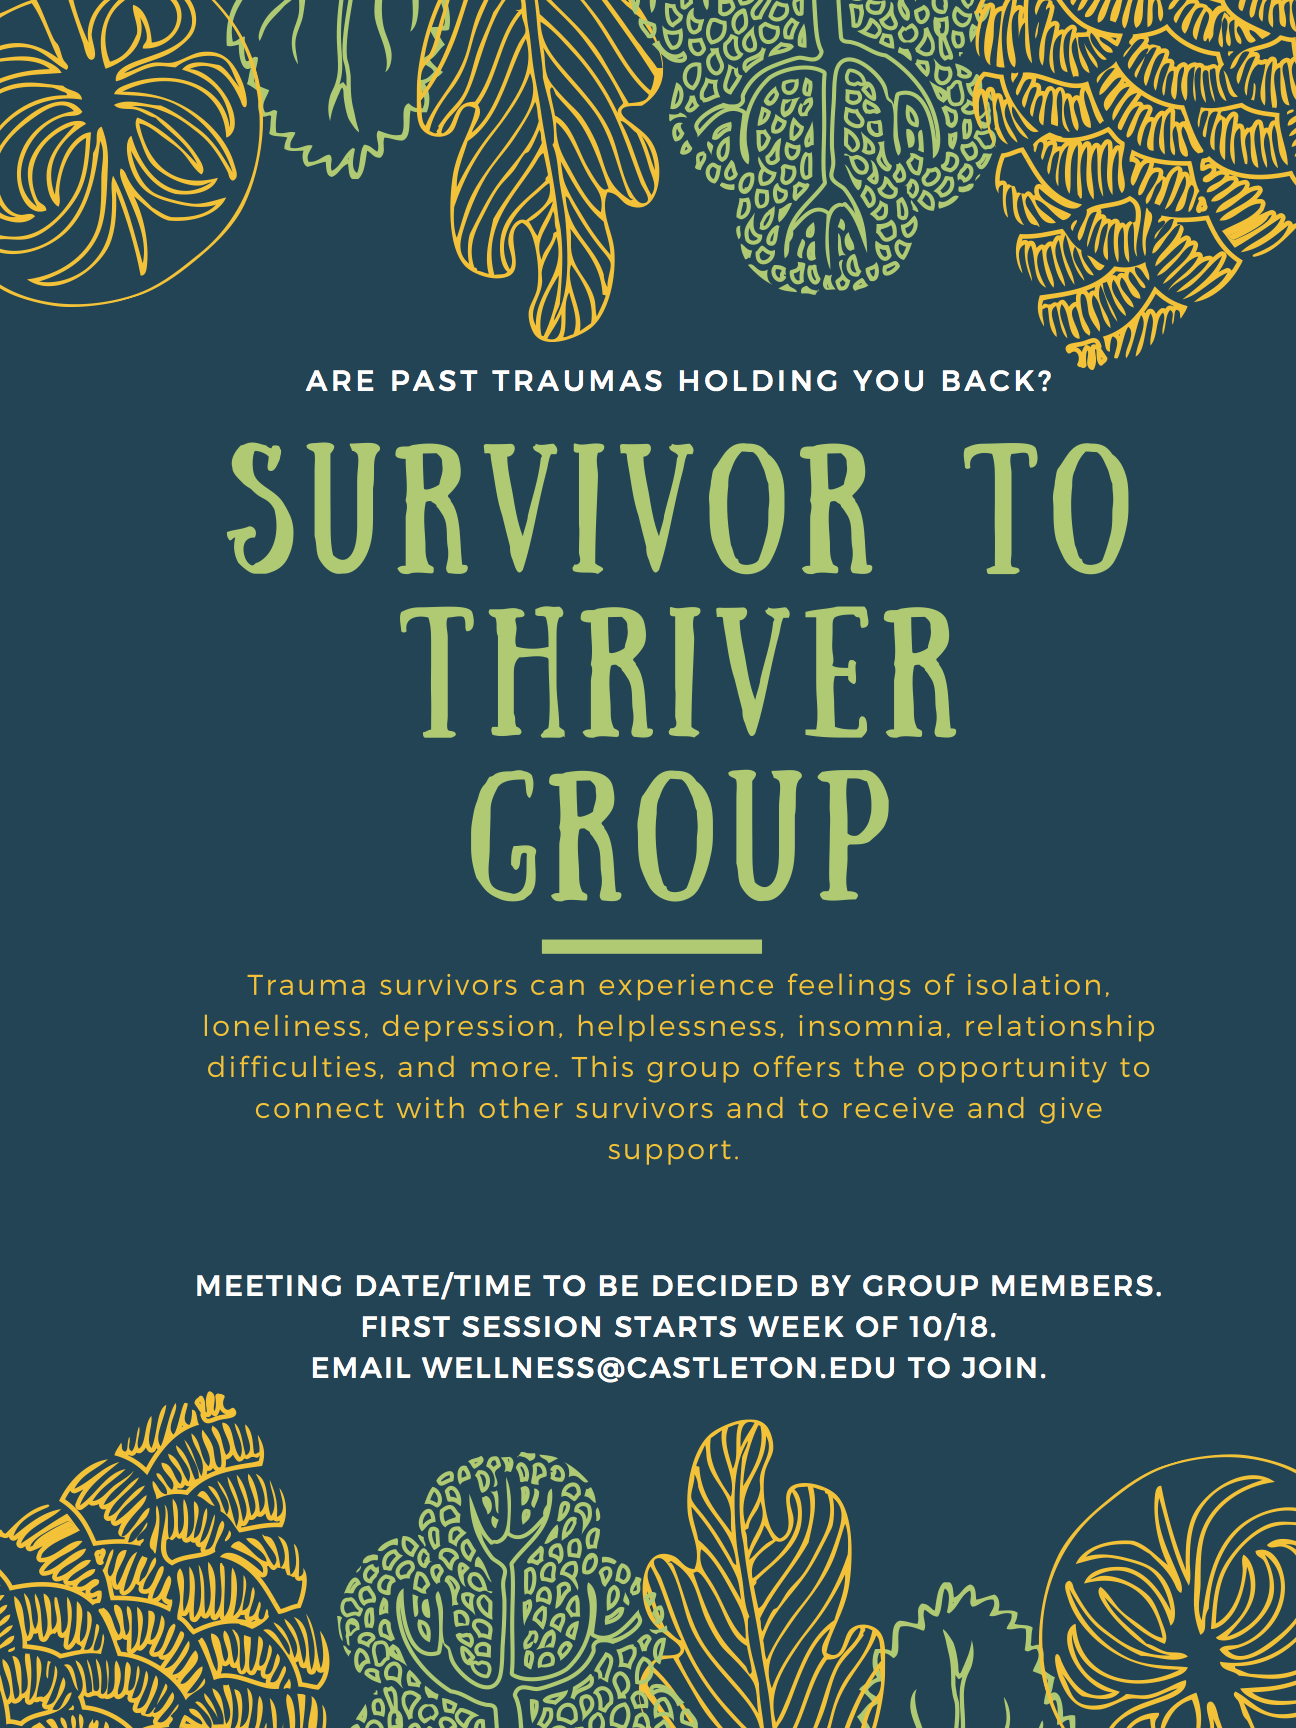 Trauma Survivor Support Group Offered